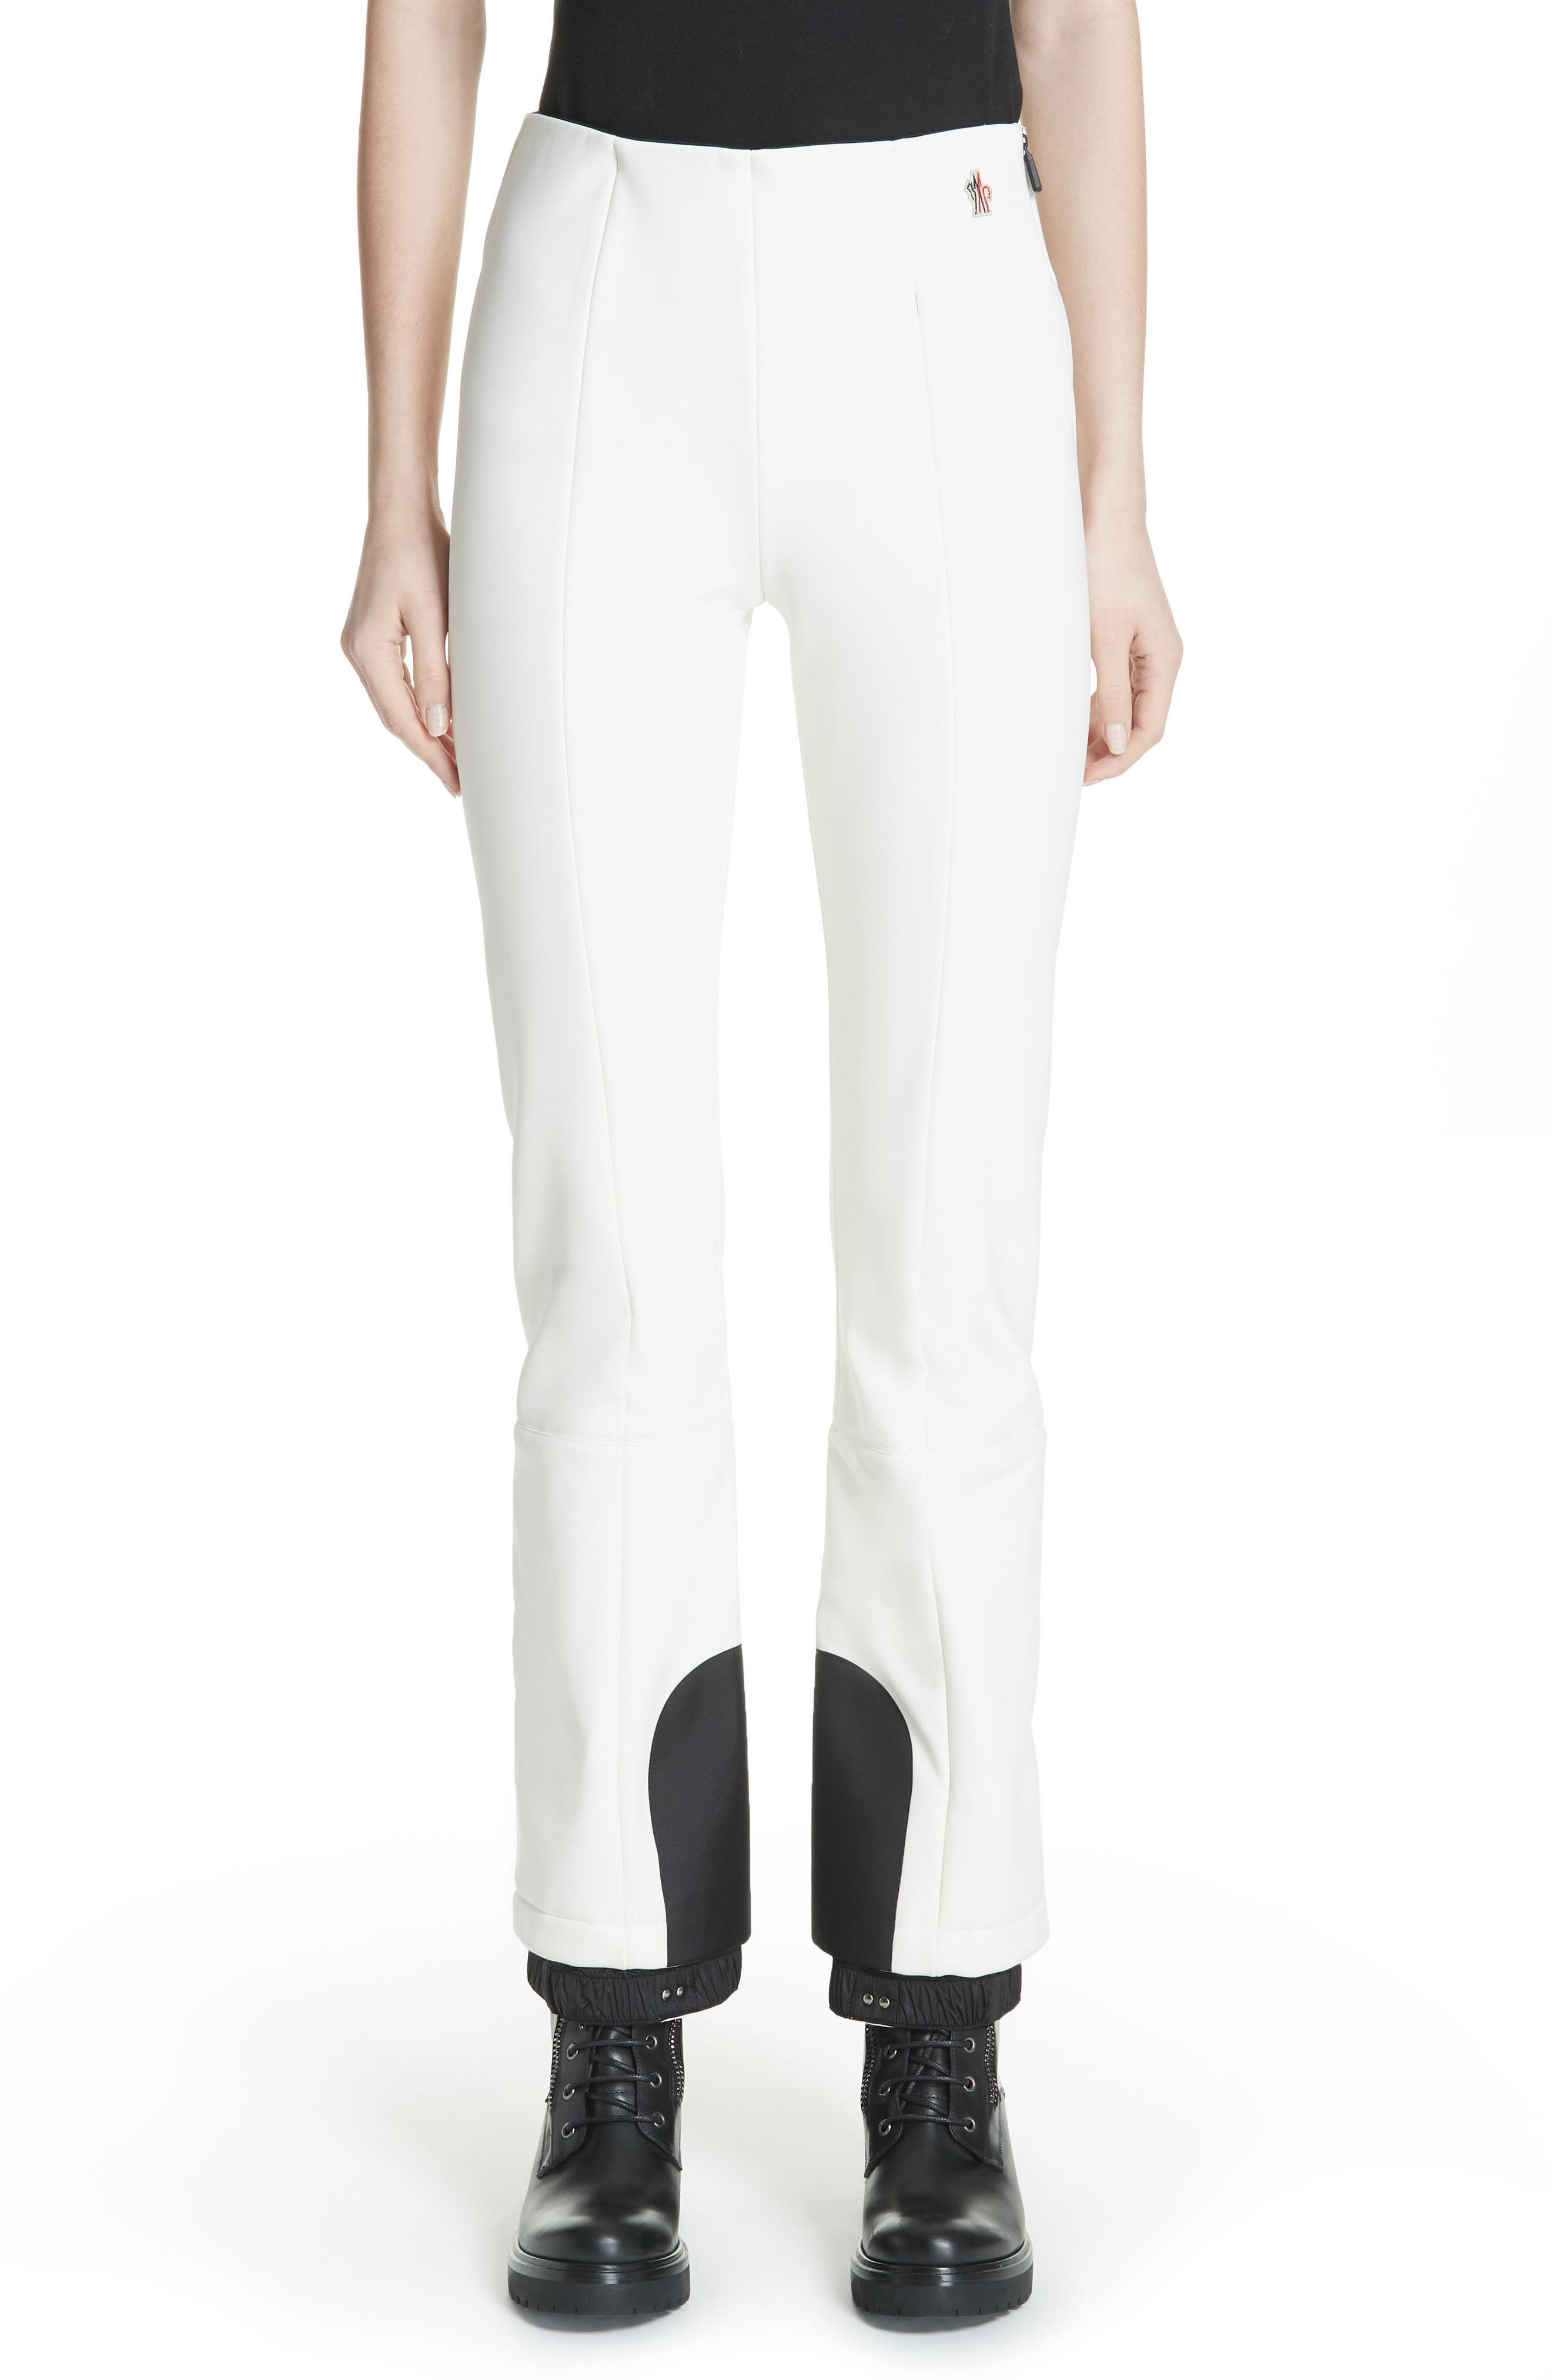 MONCLER Skinny Stretch Ski Pants, Main, color, WHITE